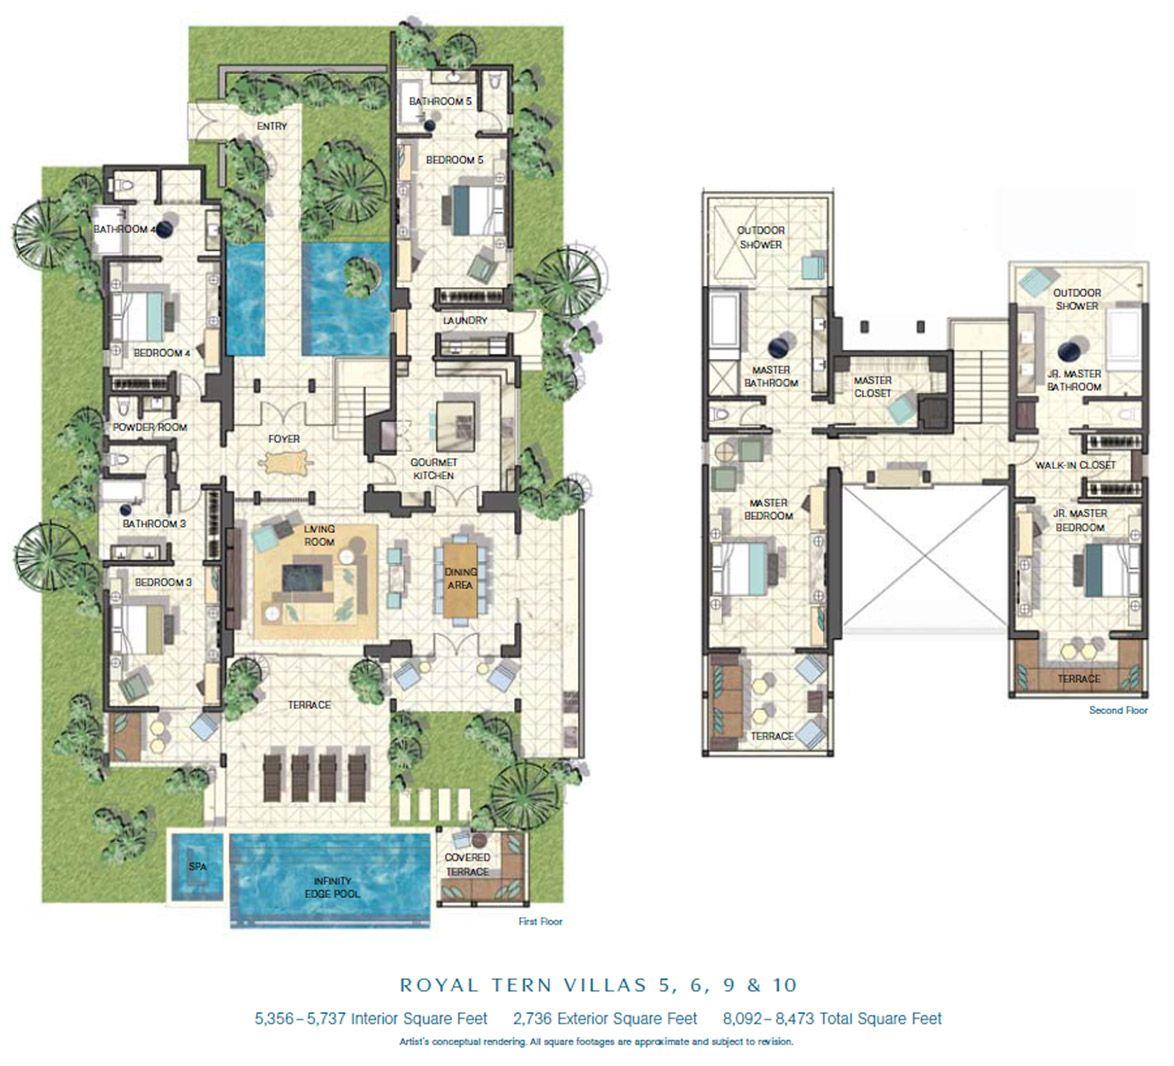 Villa Site Plan Design: Floor Plan: Royal Tern Villas 5, 6, 9 & 10 In 2019